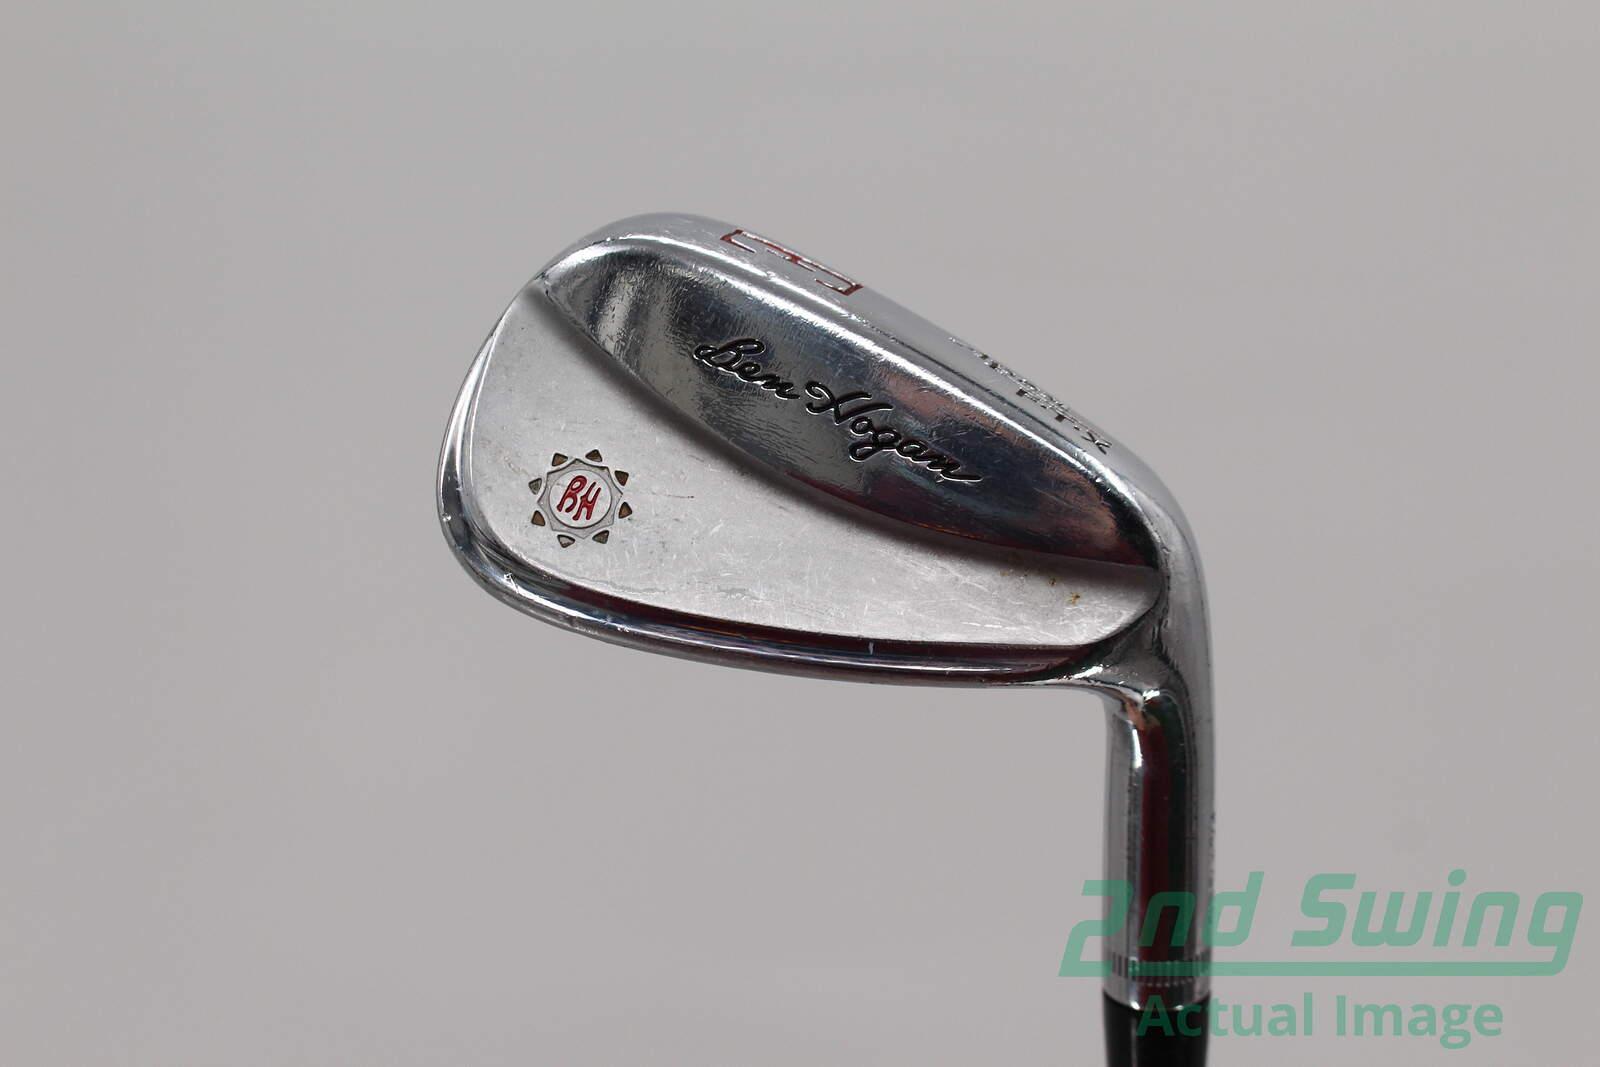 Used Ben Hogan Apex FTX Wedge Gap GW Stock Steel Shaft Steel Stiff ...